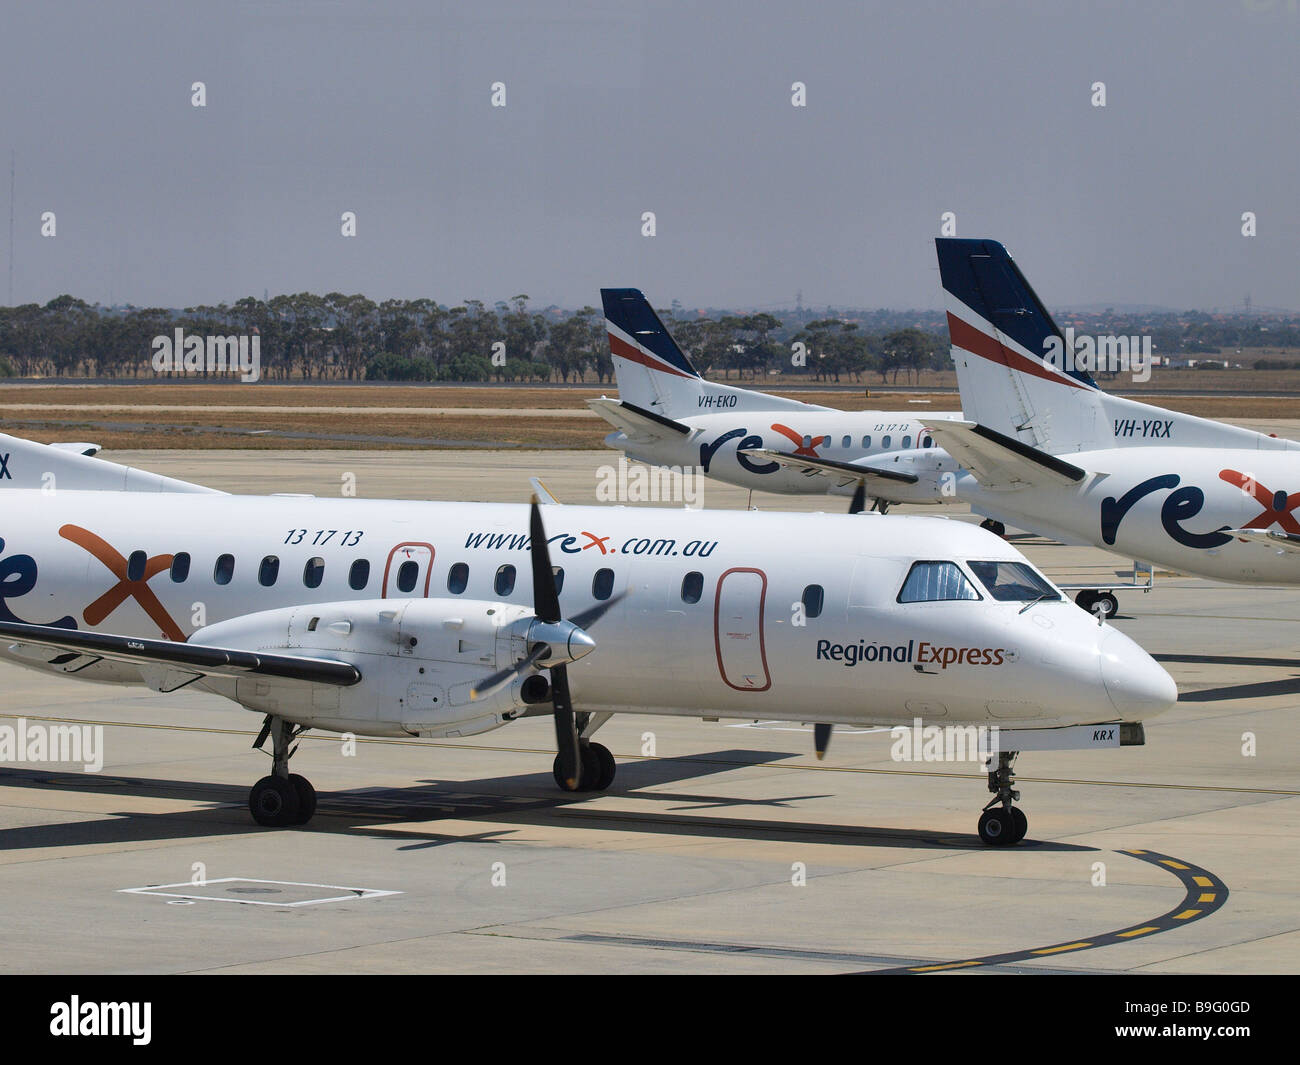 REGIONAL EXPRESS PLANES AT MELBOURNE AIRPORT, TULLAMARINE, VICTORIA - Stock Image